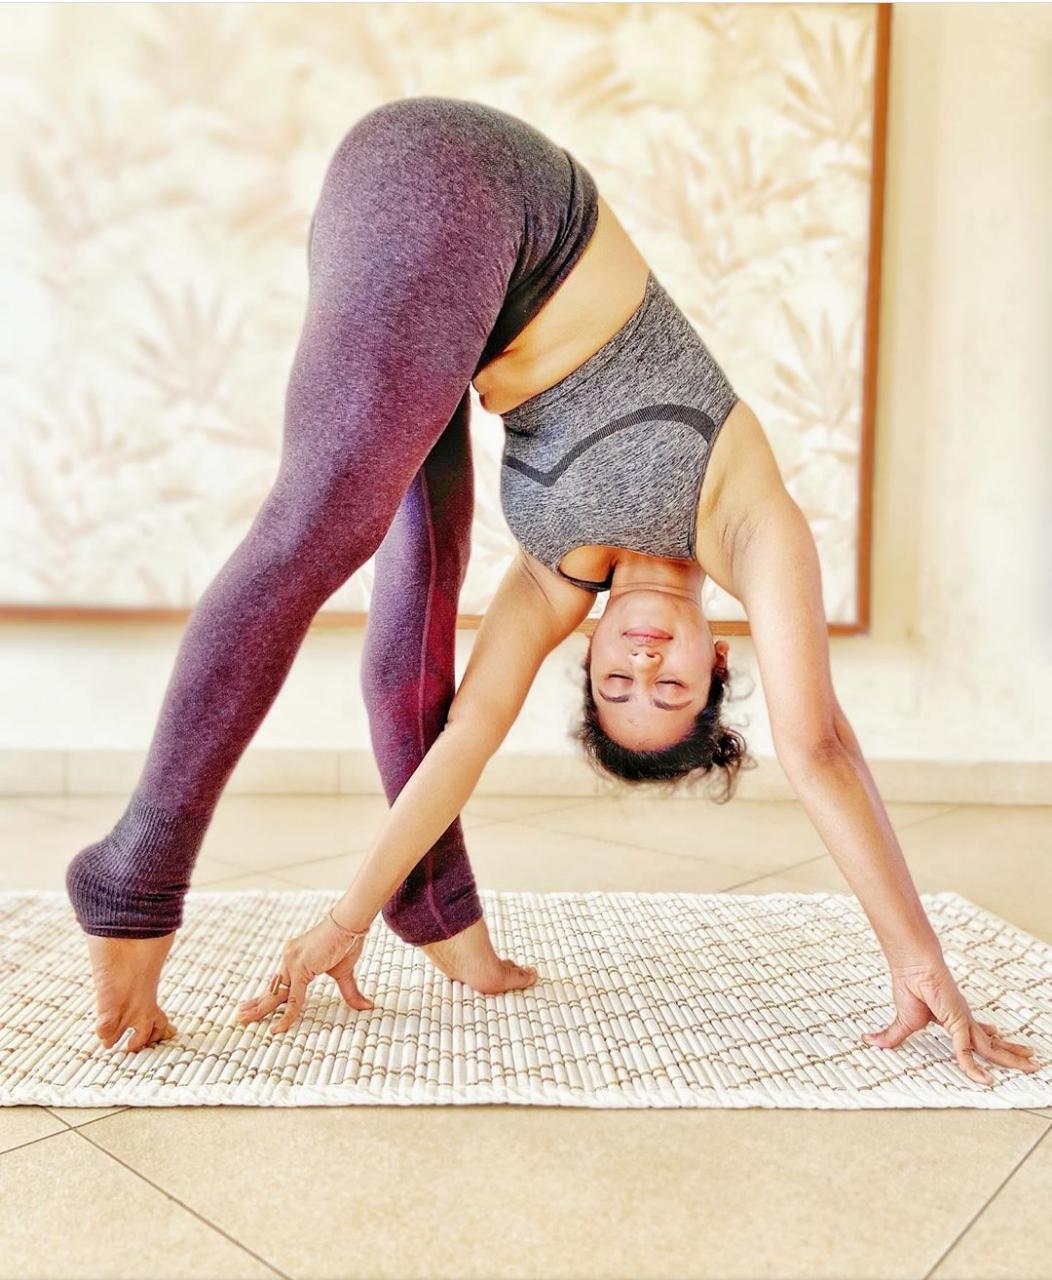 Natural yoga mat with Sambu Grass - Meditation & Sleeping